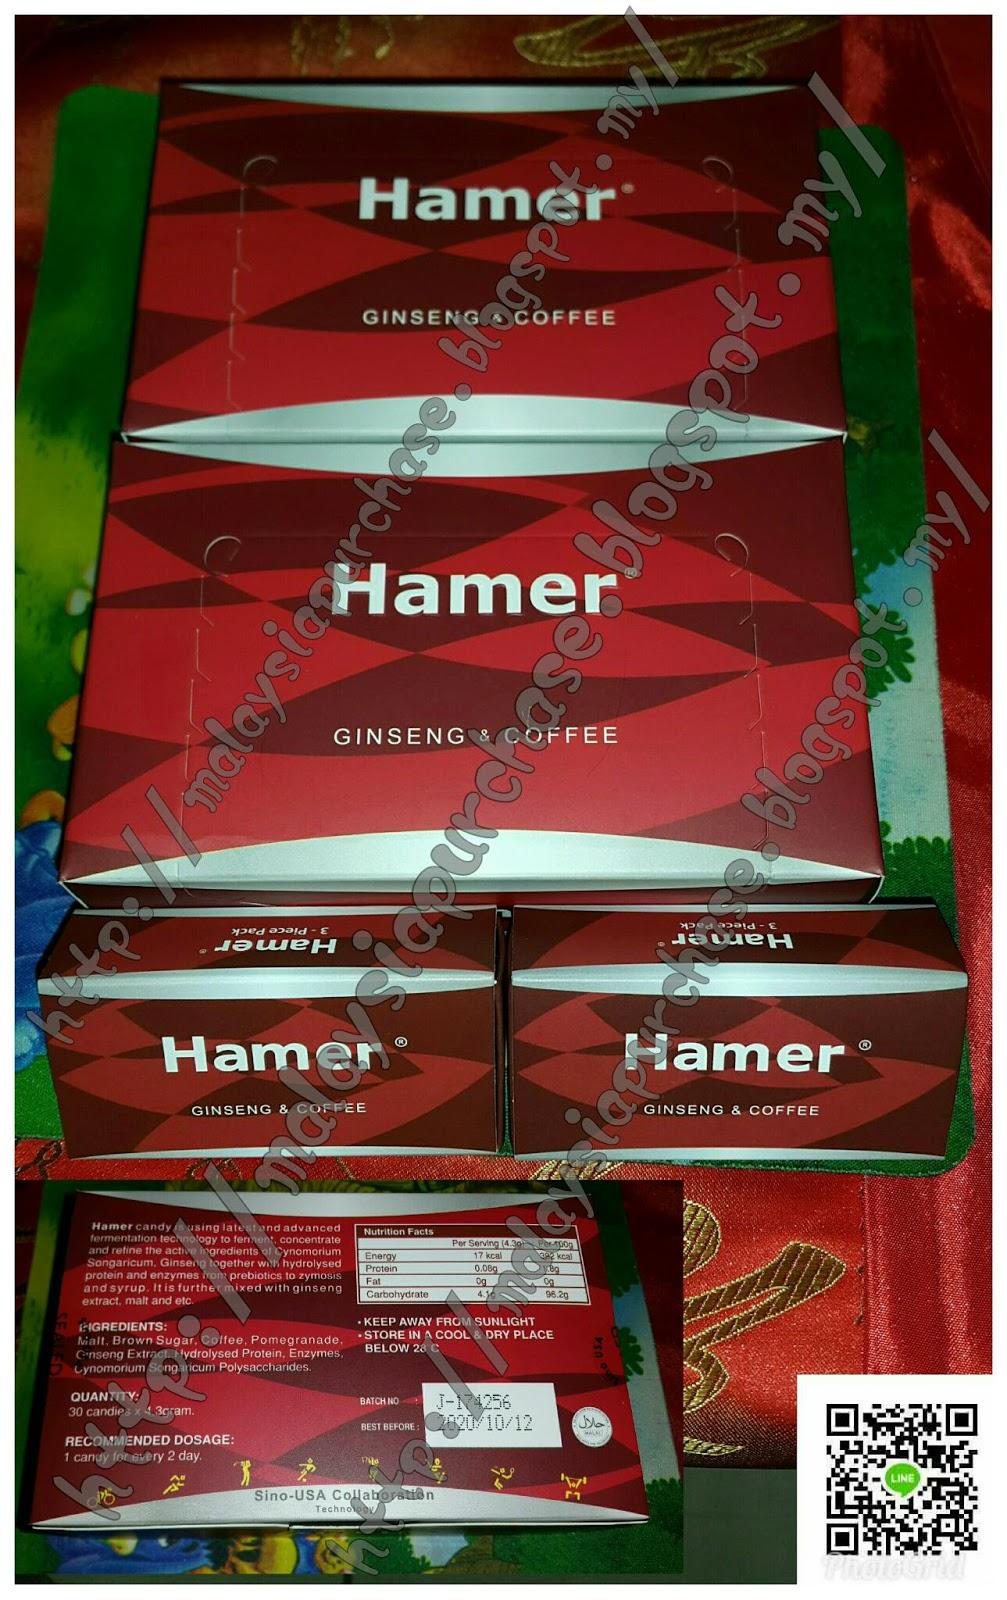 Hamer Ginseng Coffee Candy Daftar Harga Terlengkap Indonesia Permen